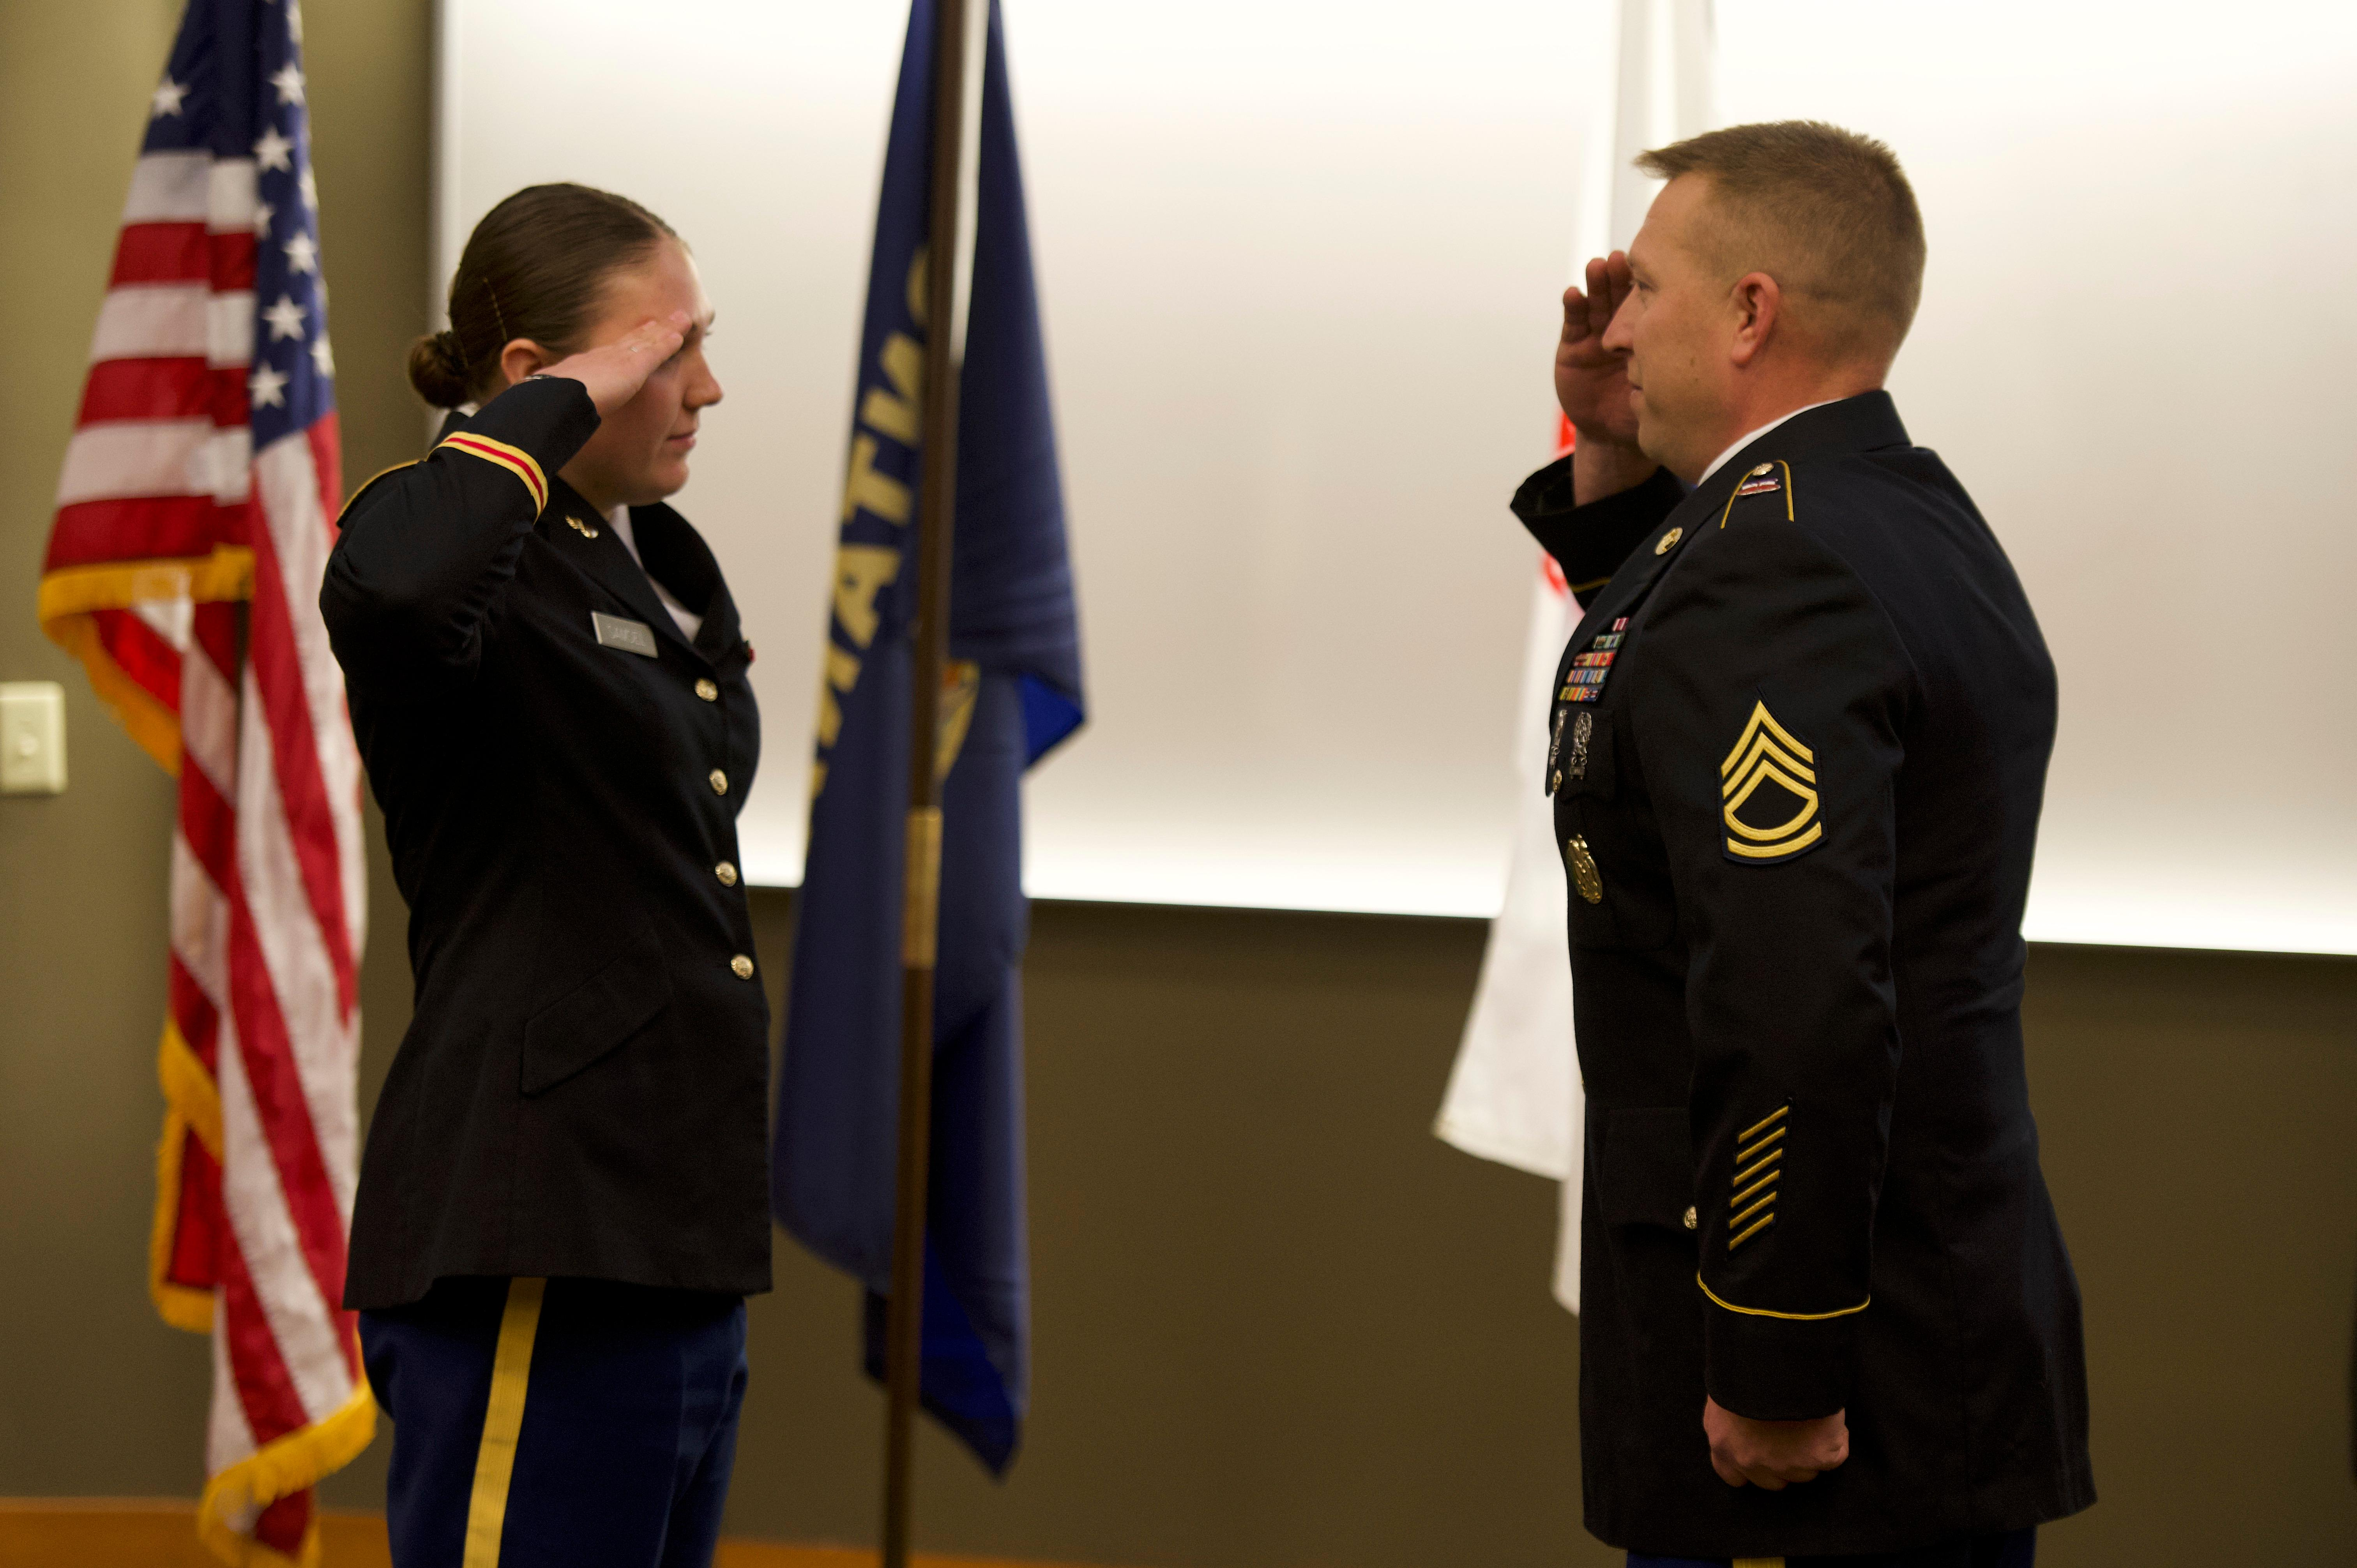 Cadet Haylee Samsel saluting an officer.